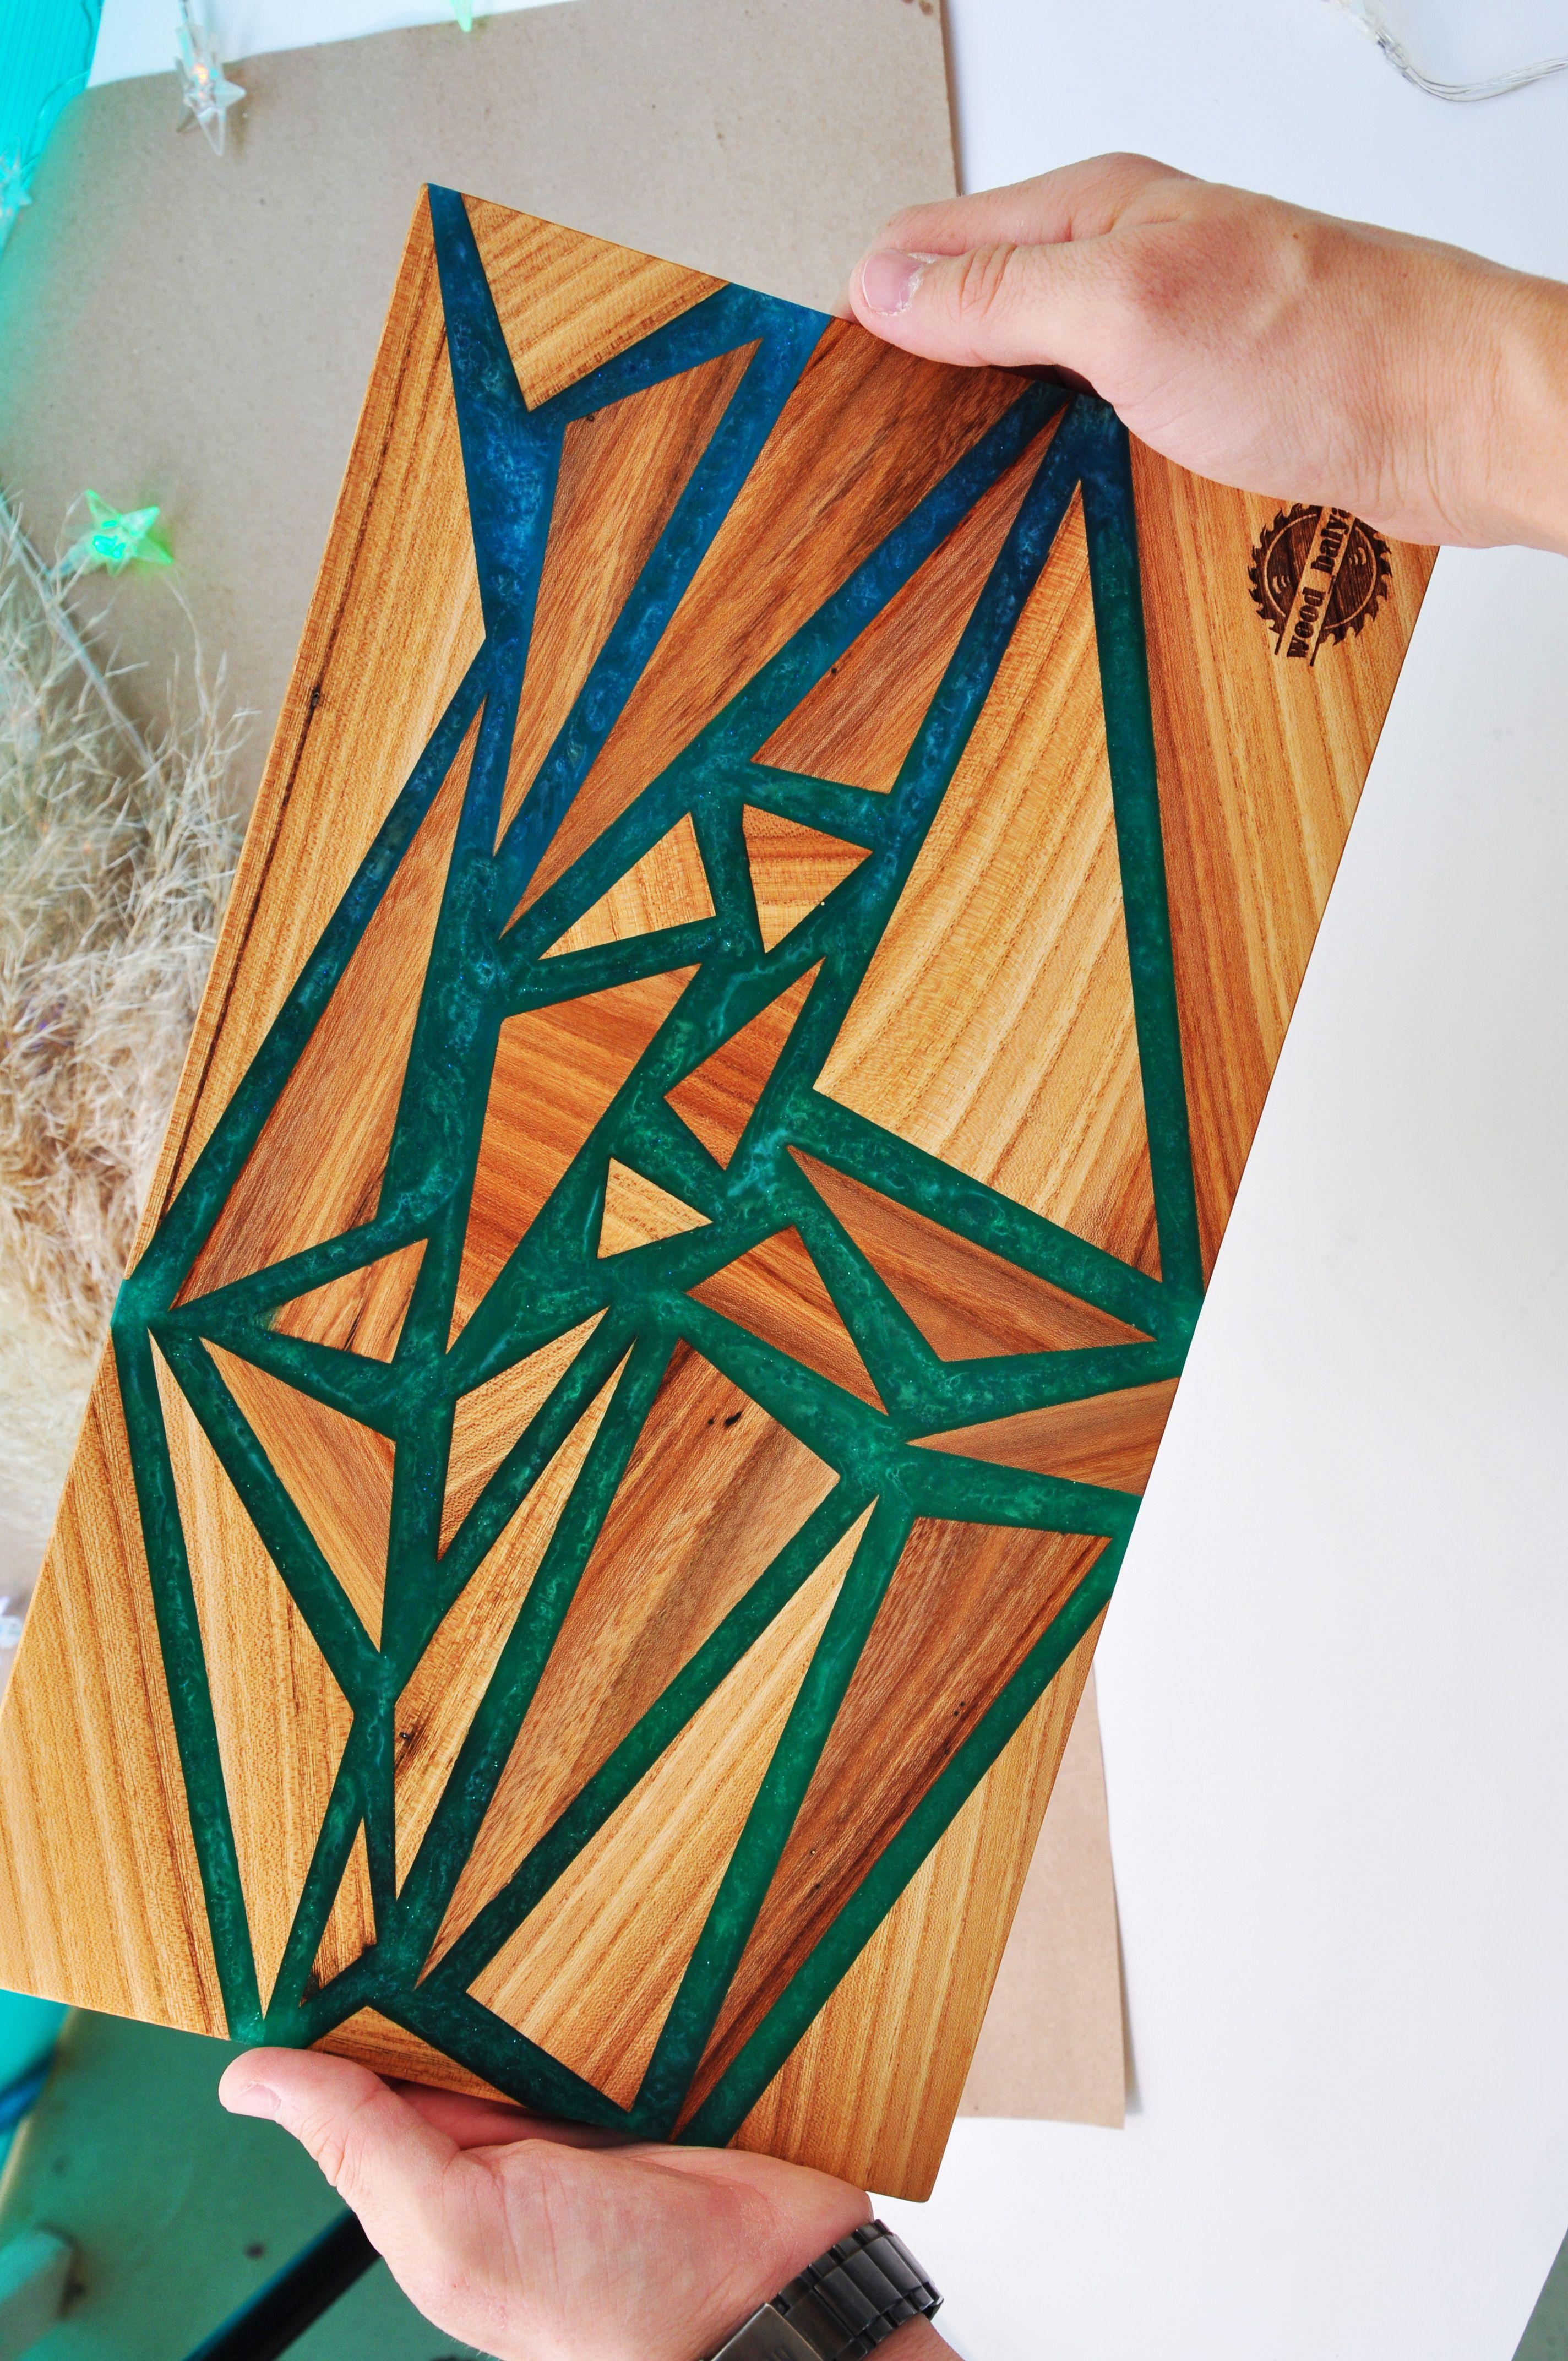 Pin By Amanda Deacon On Oddball Creations Ideas Resin Crafts